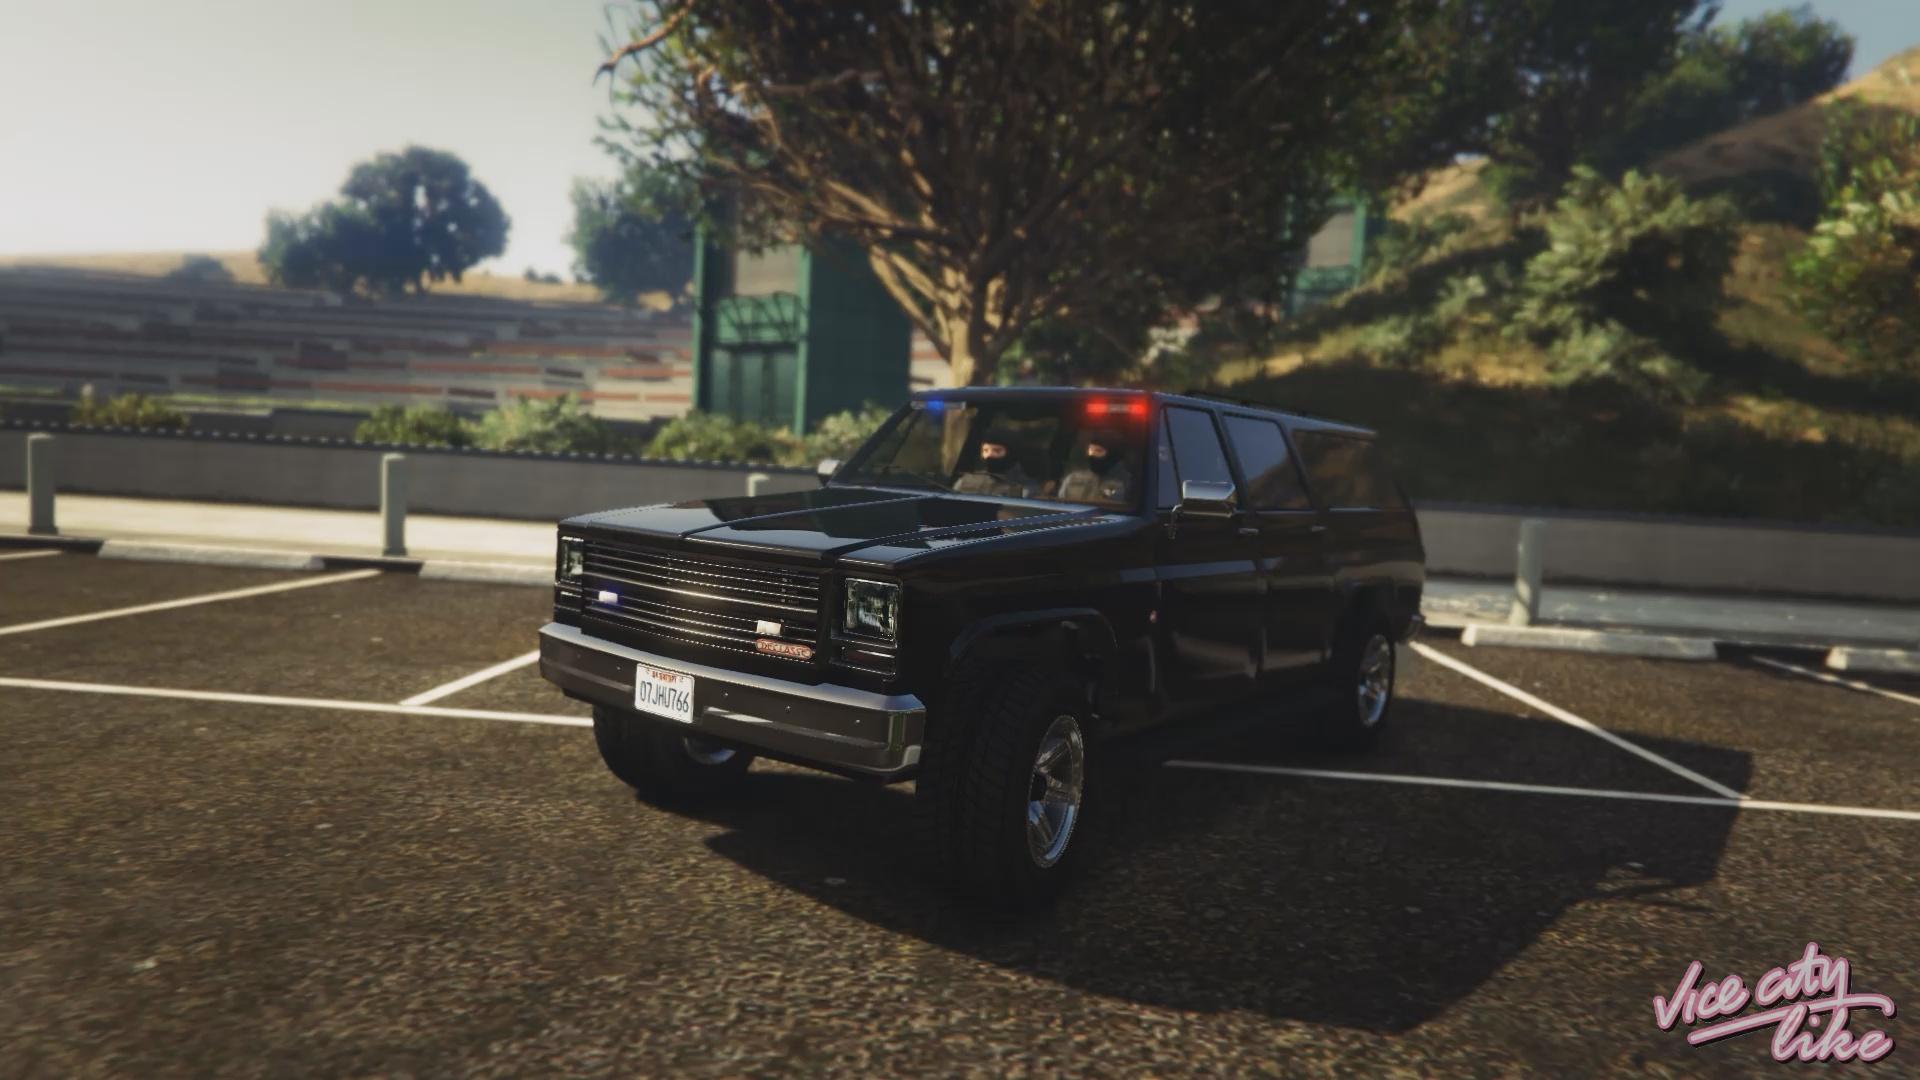 F I B  Rancher (Like Vice City) - GTA5-Mods com